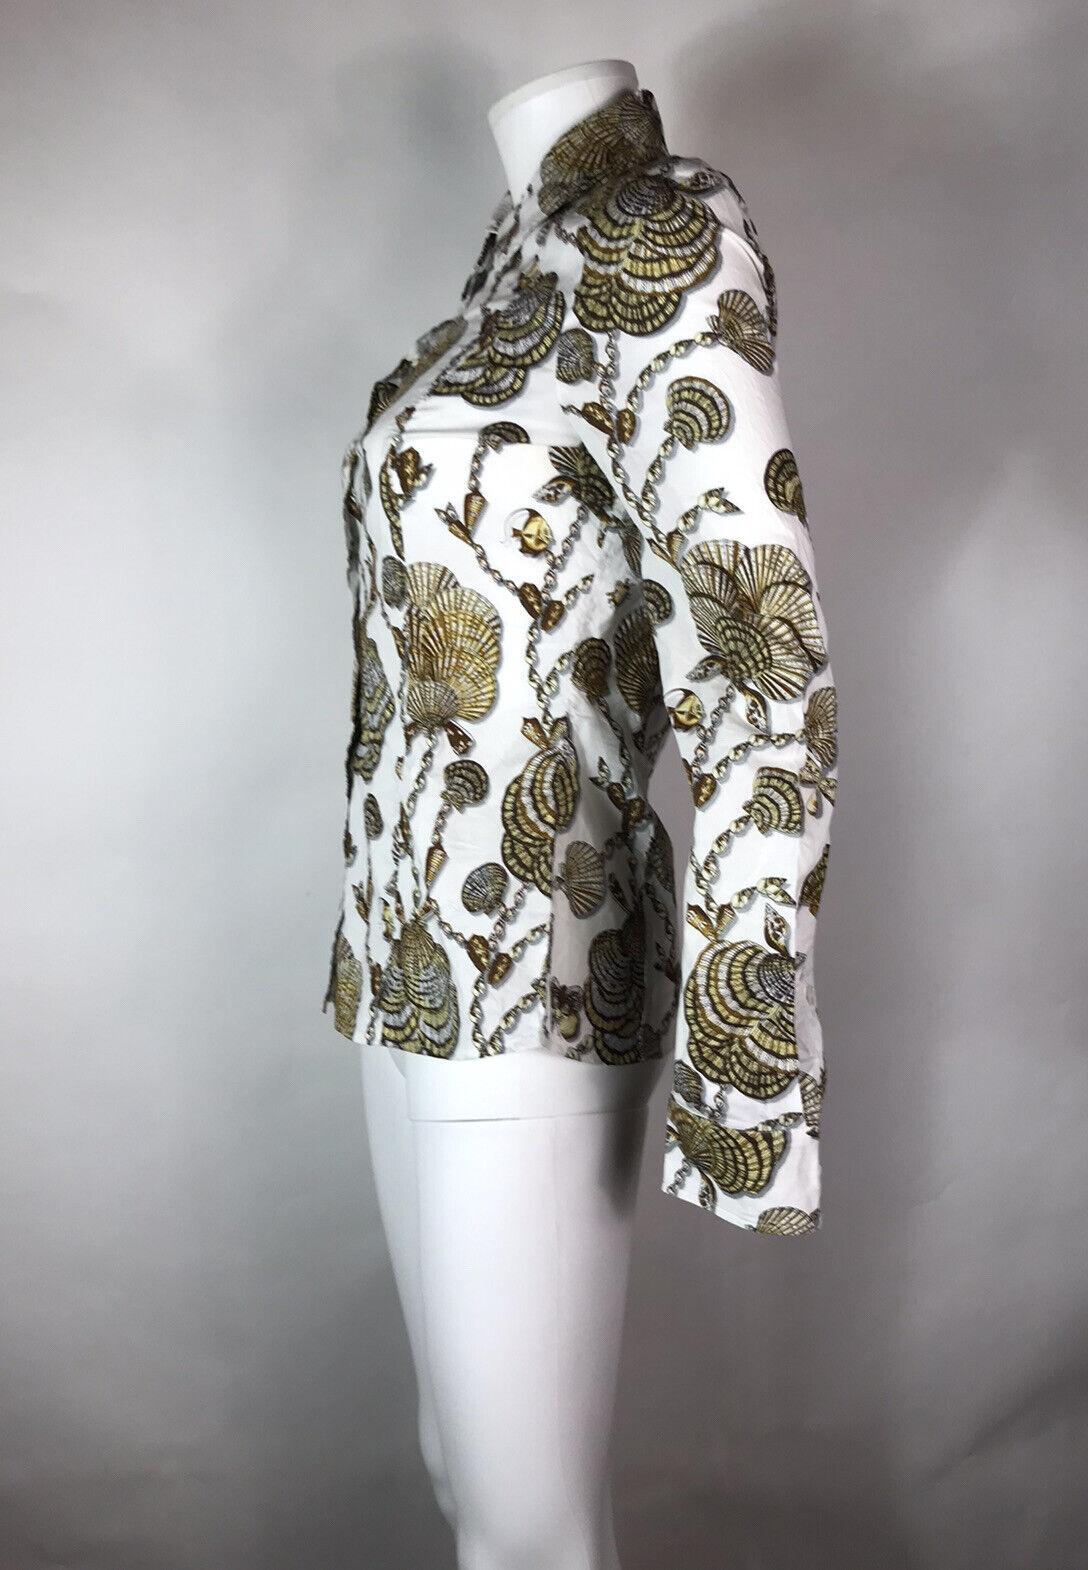 Rare Vtg Gucci White Seashell Print Top S - image 4